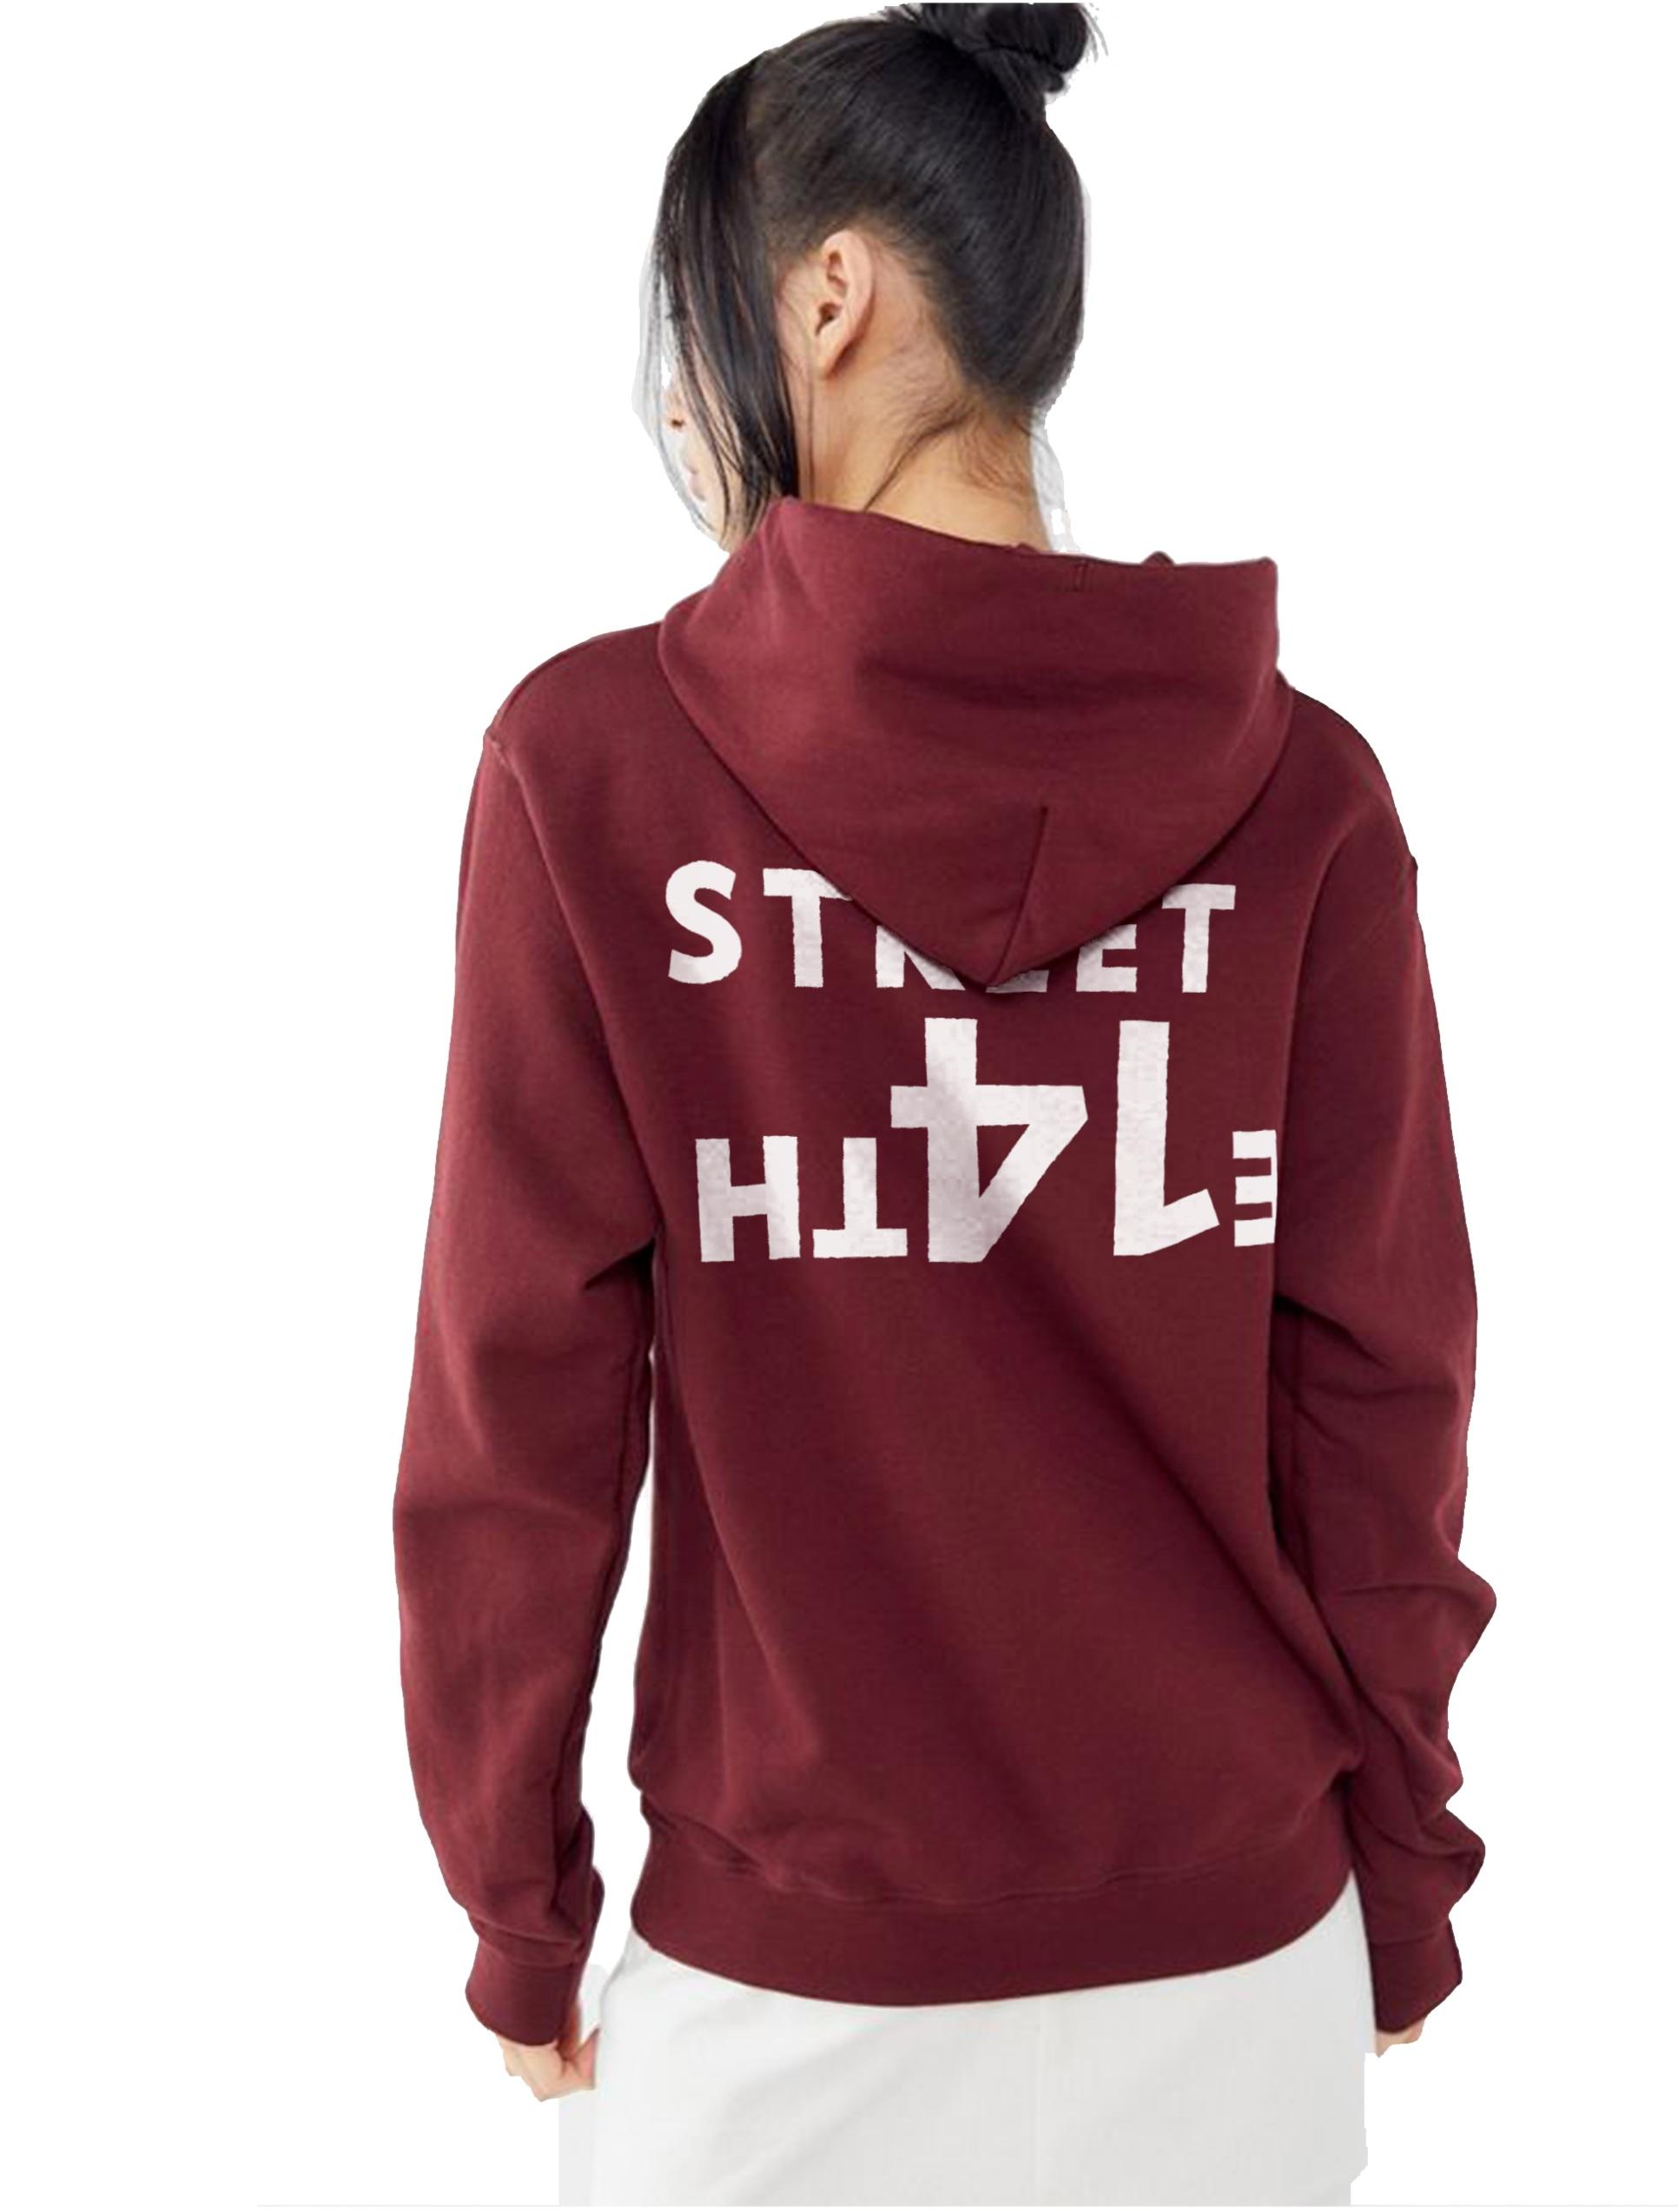 Sky_Oak_Co_East_14th_Street_maroon_white_hoodie_back_female_model.png